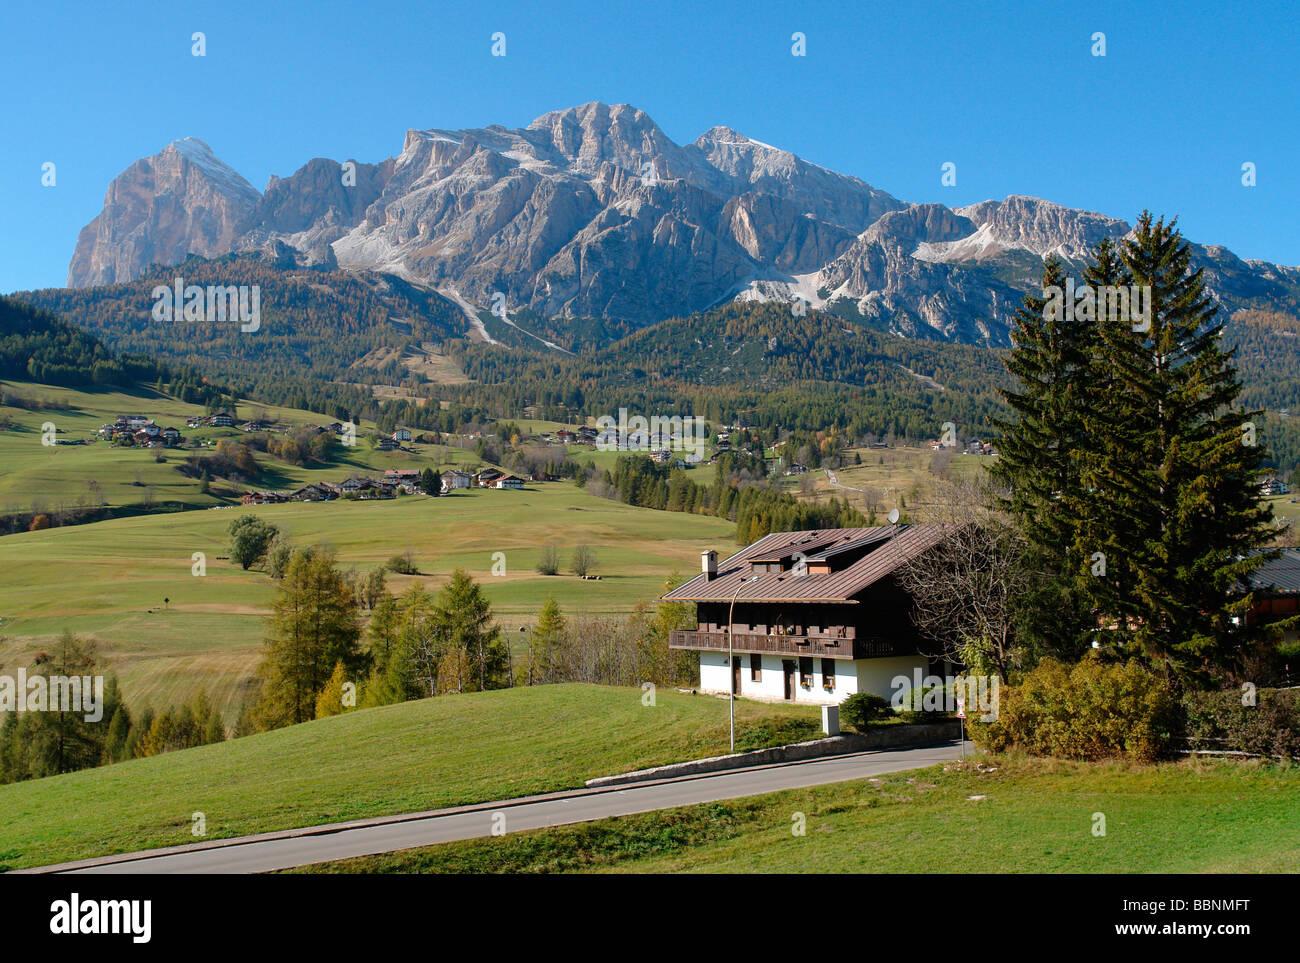 geography / travel, Italy, Trentino - Alto Adige, Cortina d'Ampezzo: Landscape with Cristallo Massif, Additional - Stock Image